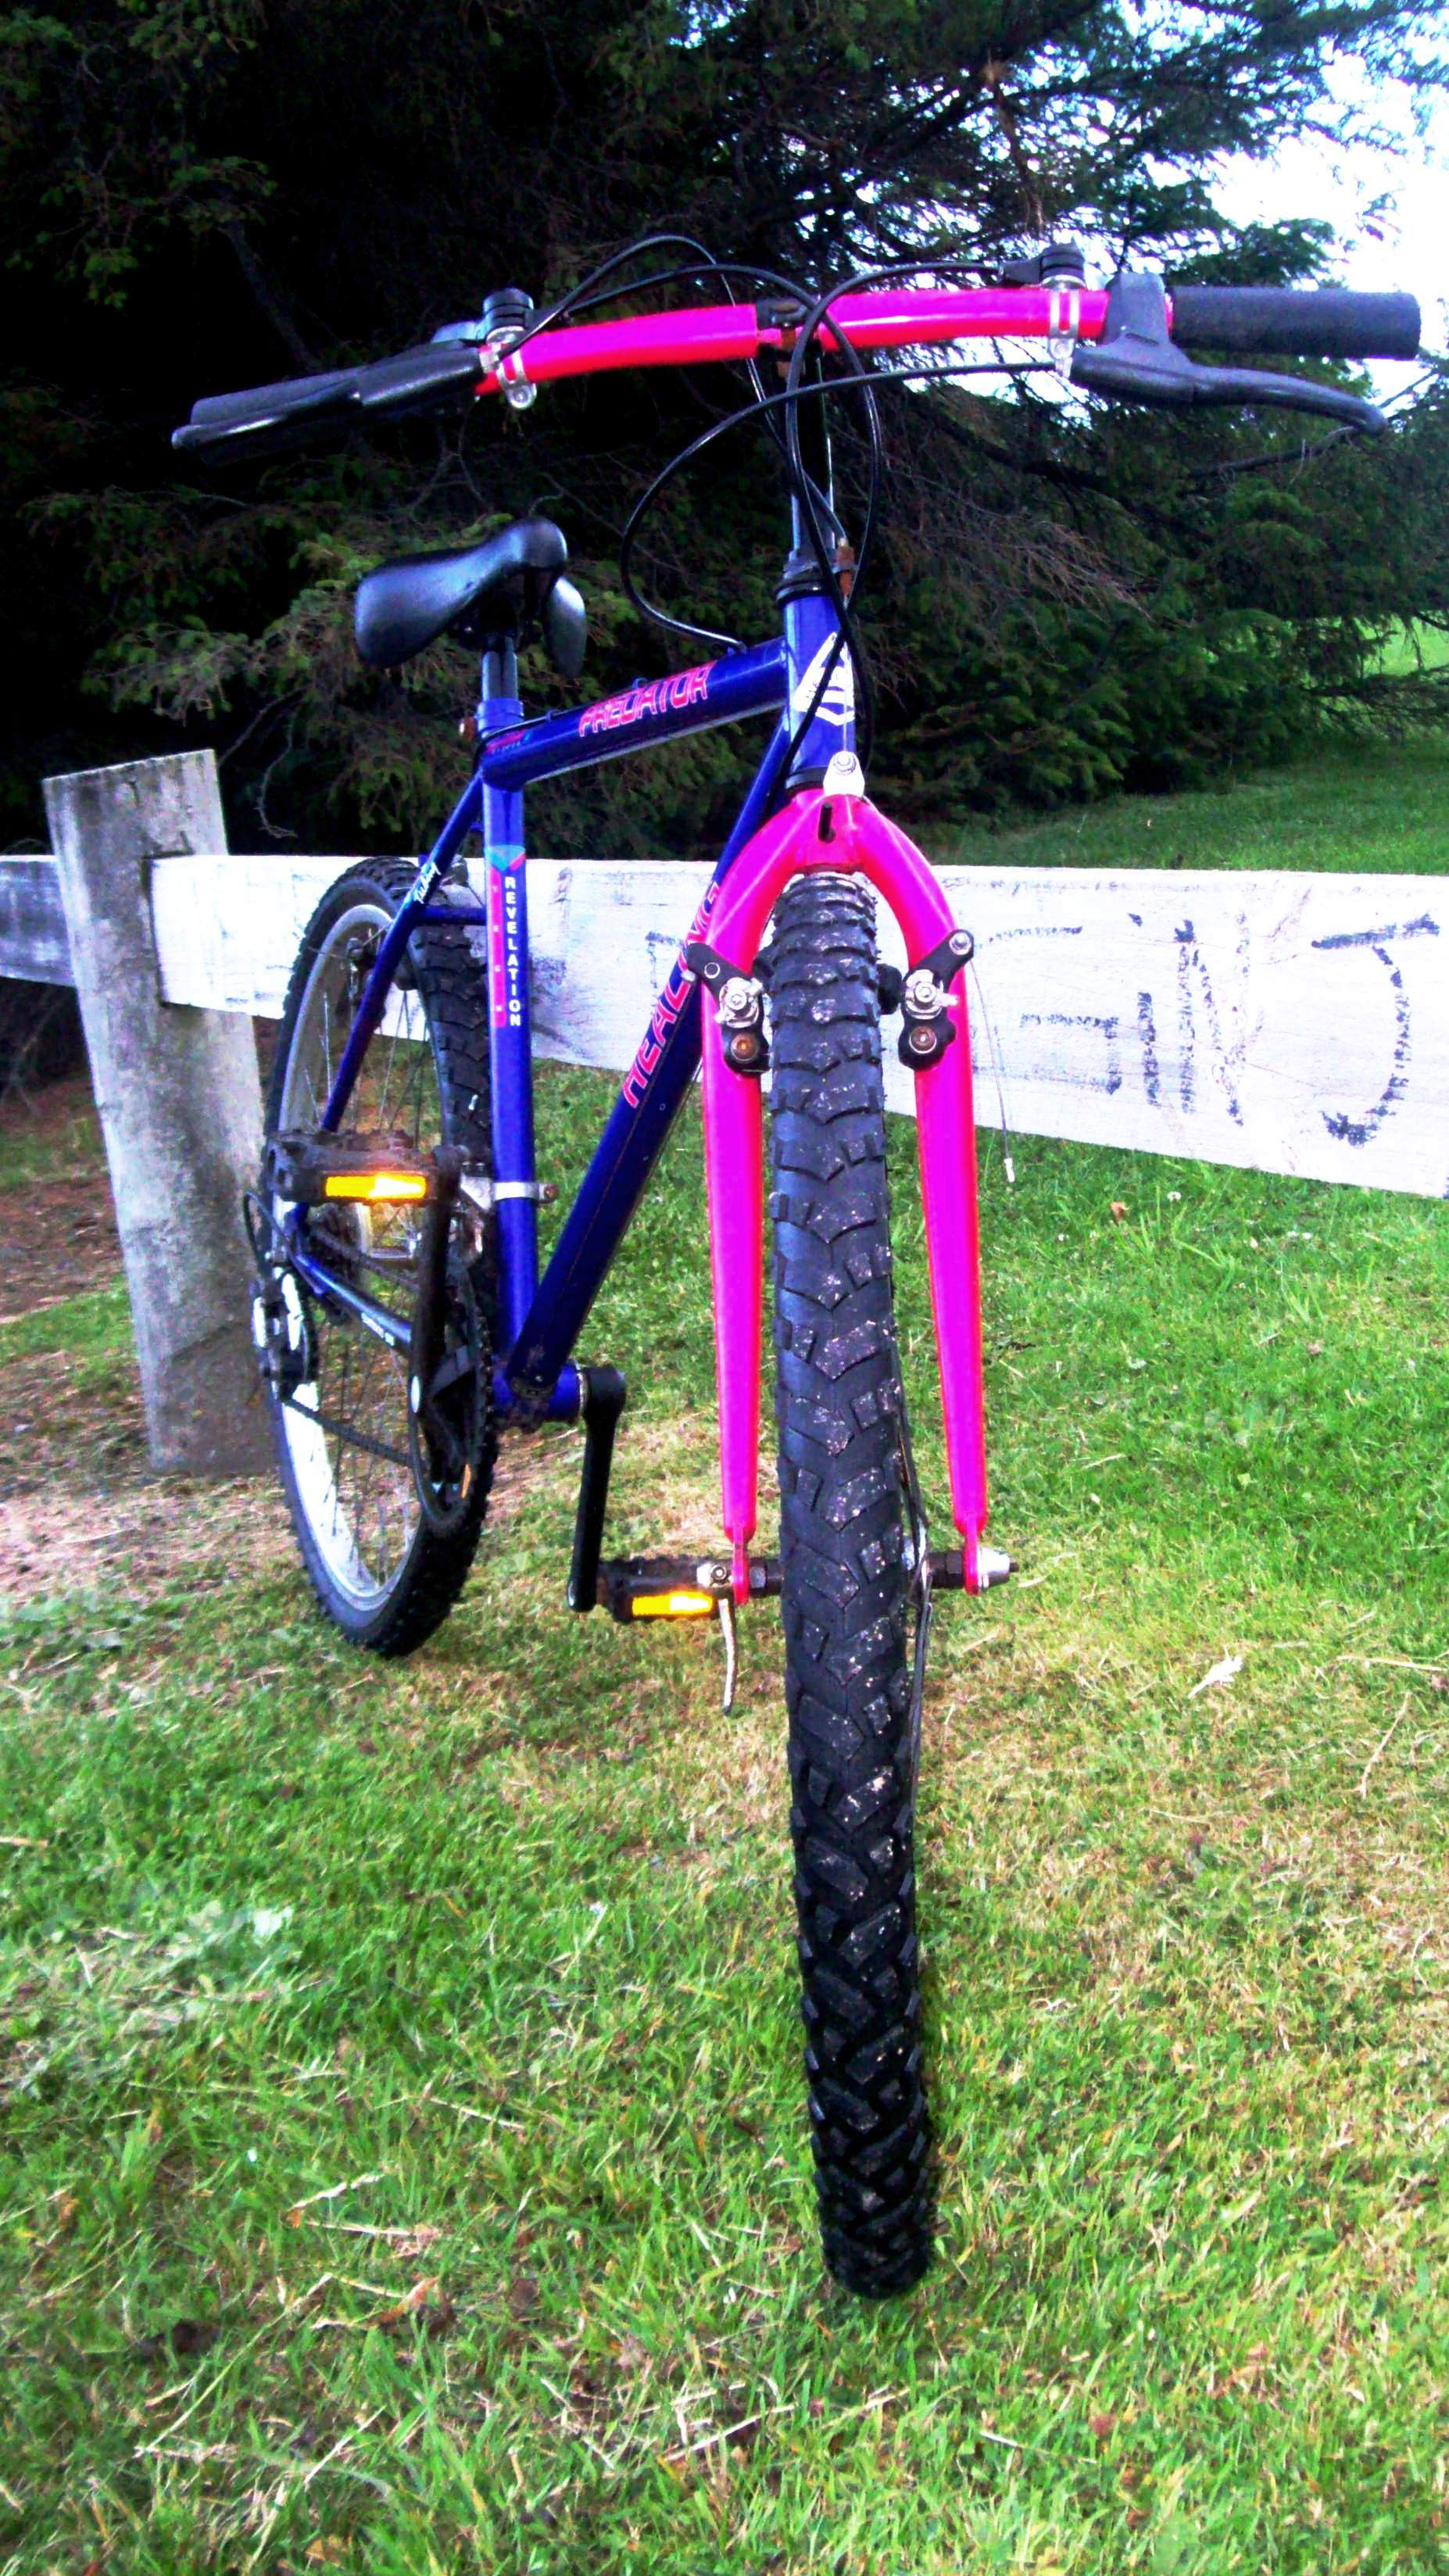 Majas gender coded  Healing Predator Bik, Activity, Ride, Outfit, Paint, HQ Photo